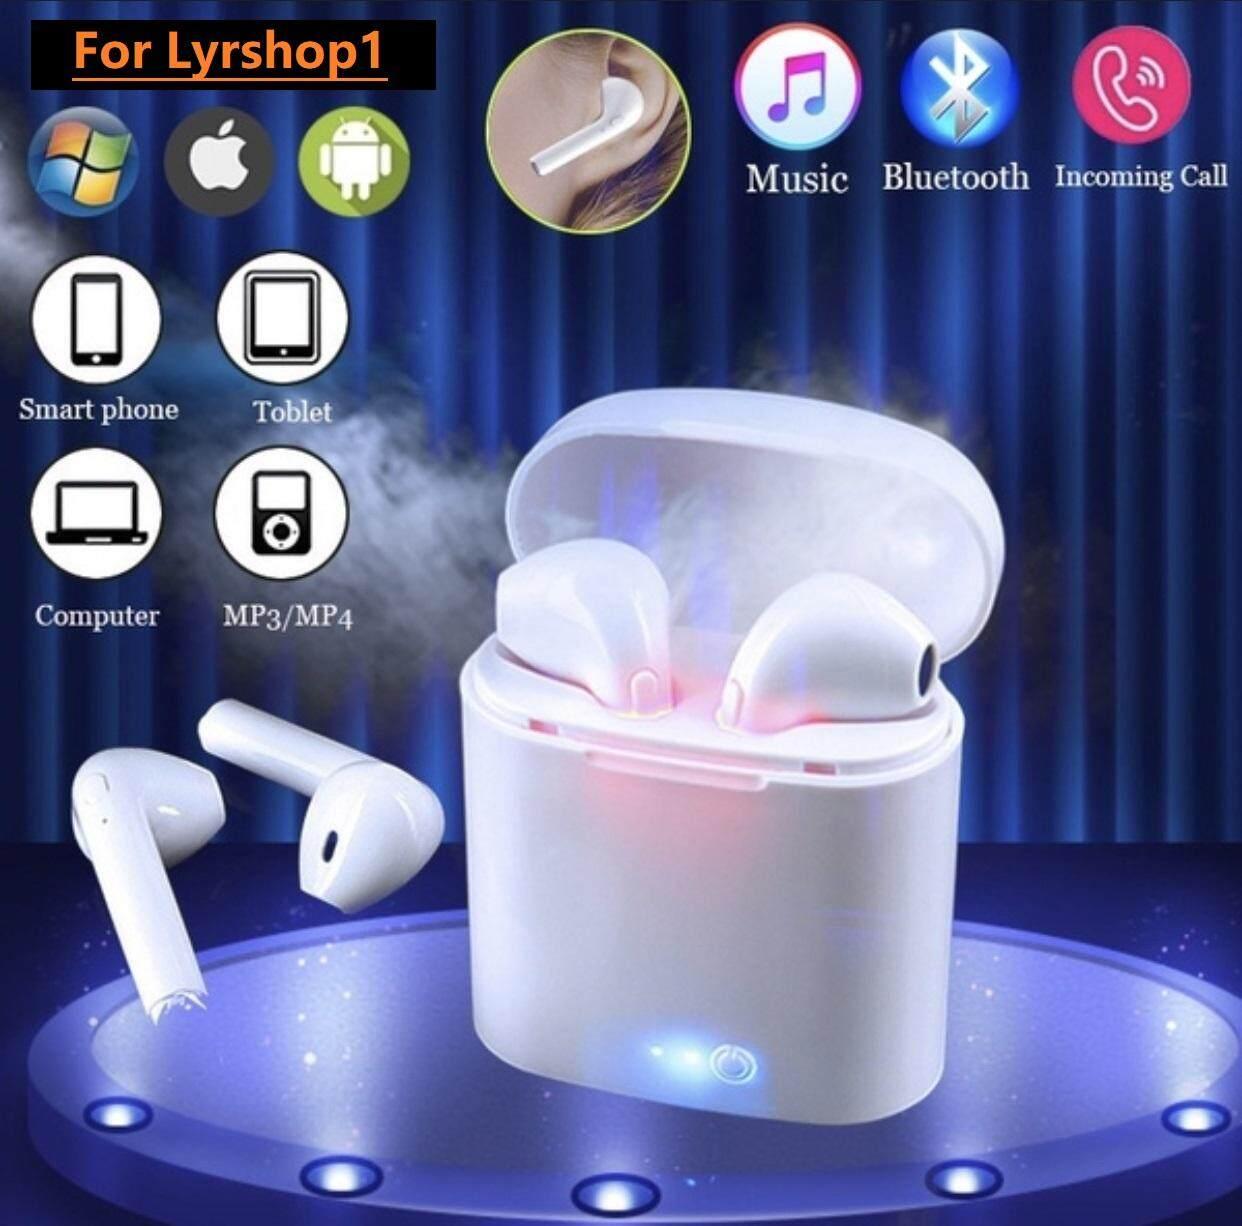 I7s Tws Afans Bluetooth 4.2 Mini Wireless Bluetooth พร้อมกล่องชารจ์ หูฟัง บลูทูธ 2 ข้าง Sterio Wireless Music Bluetooth Earphone 4.2 Stereo หูฟังไร้สายแบบคู่ For Iphone & Samsung โทรศัพท์ทุกรุ่น By Mybox087.